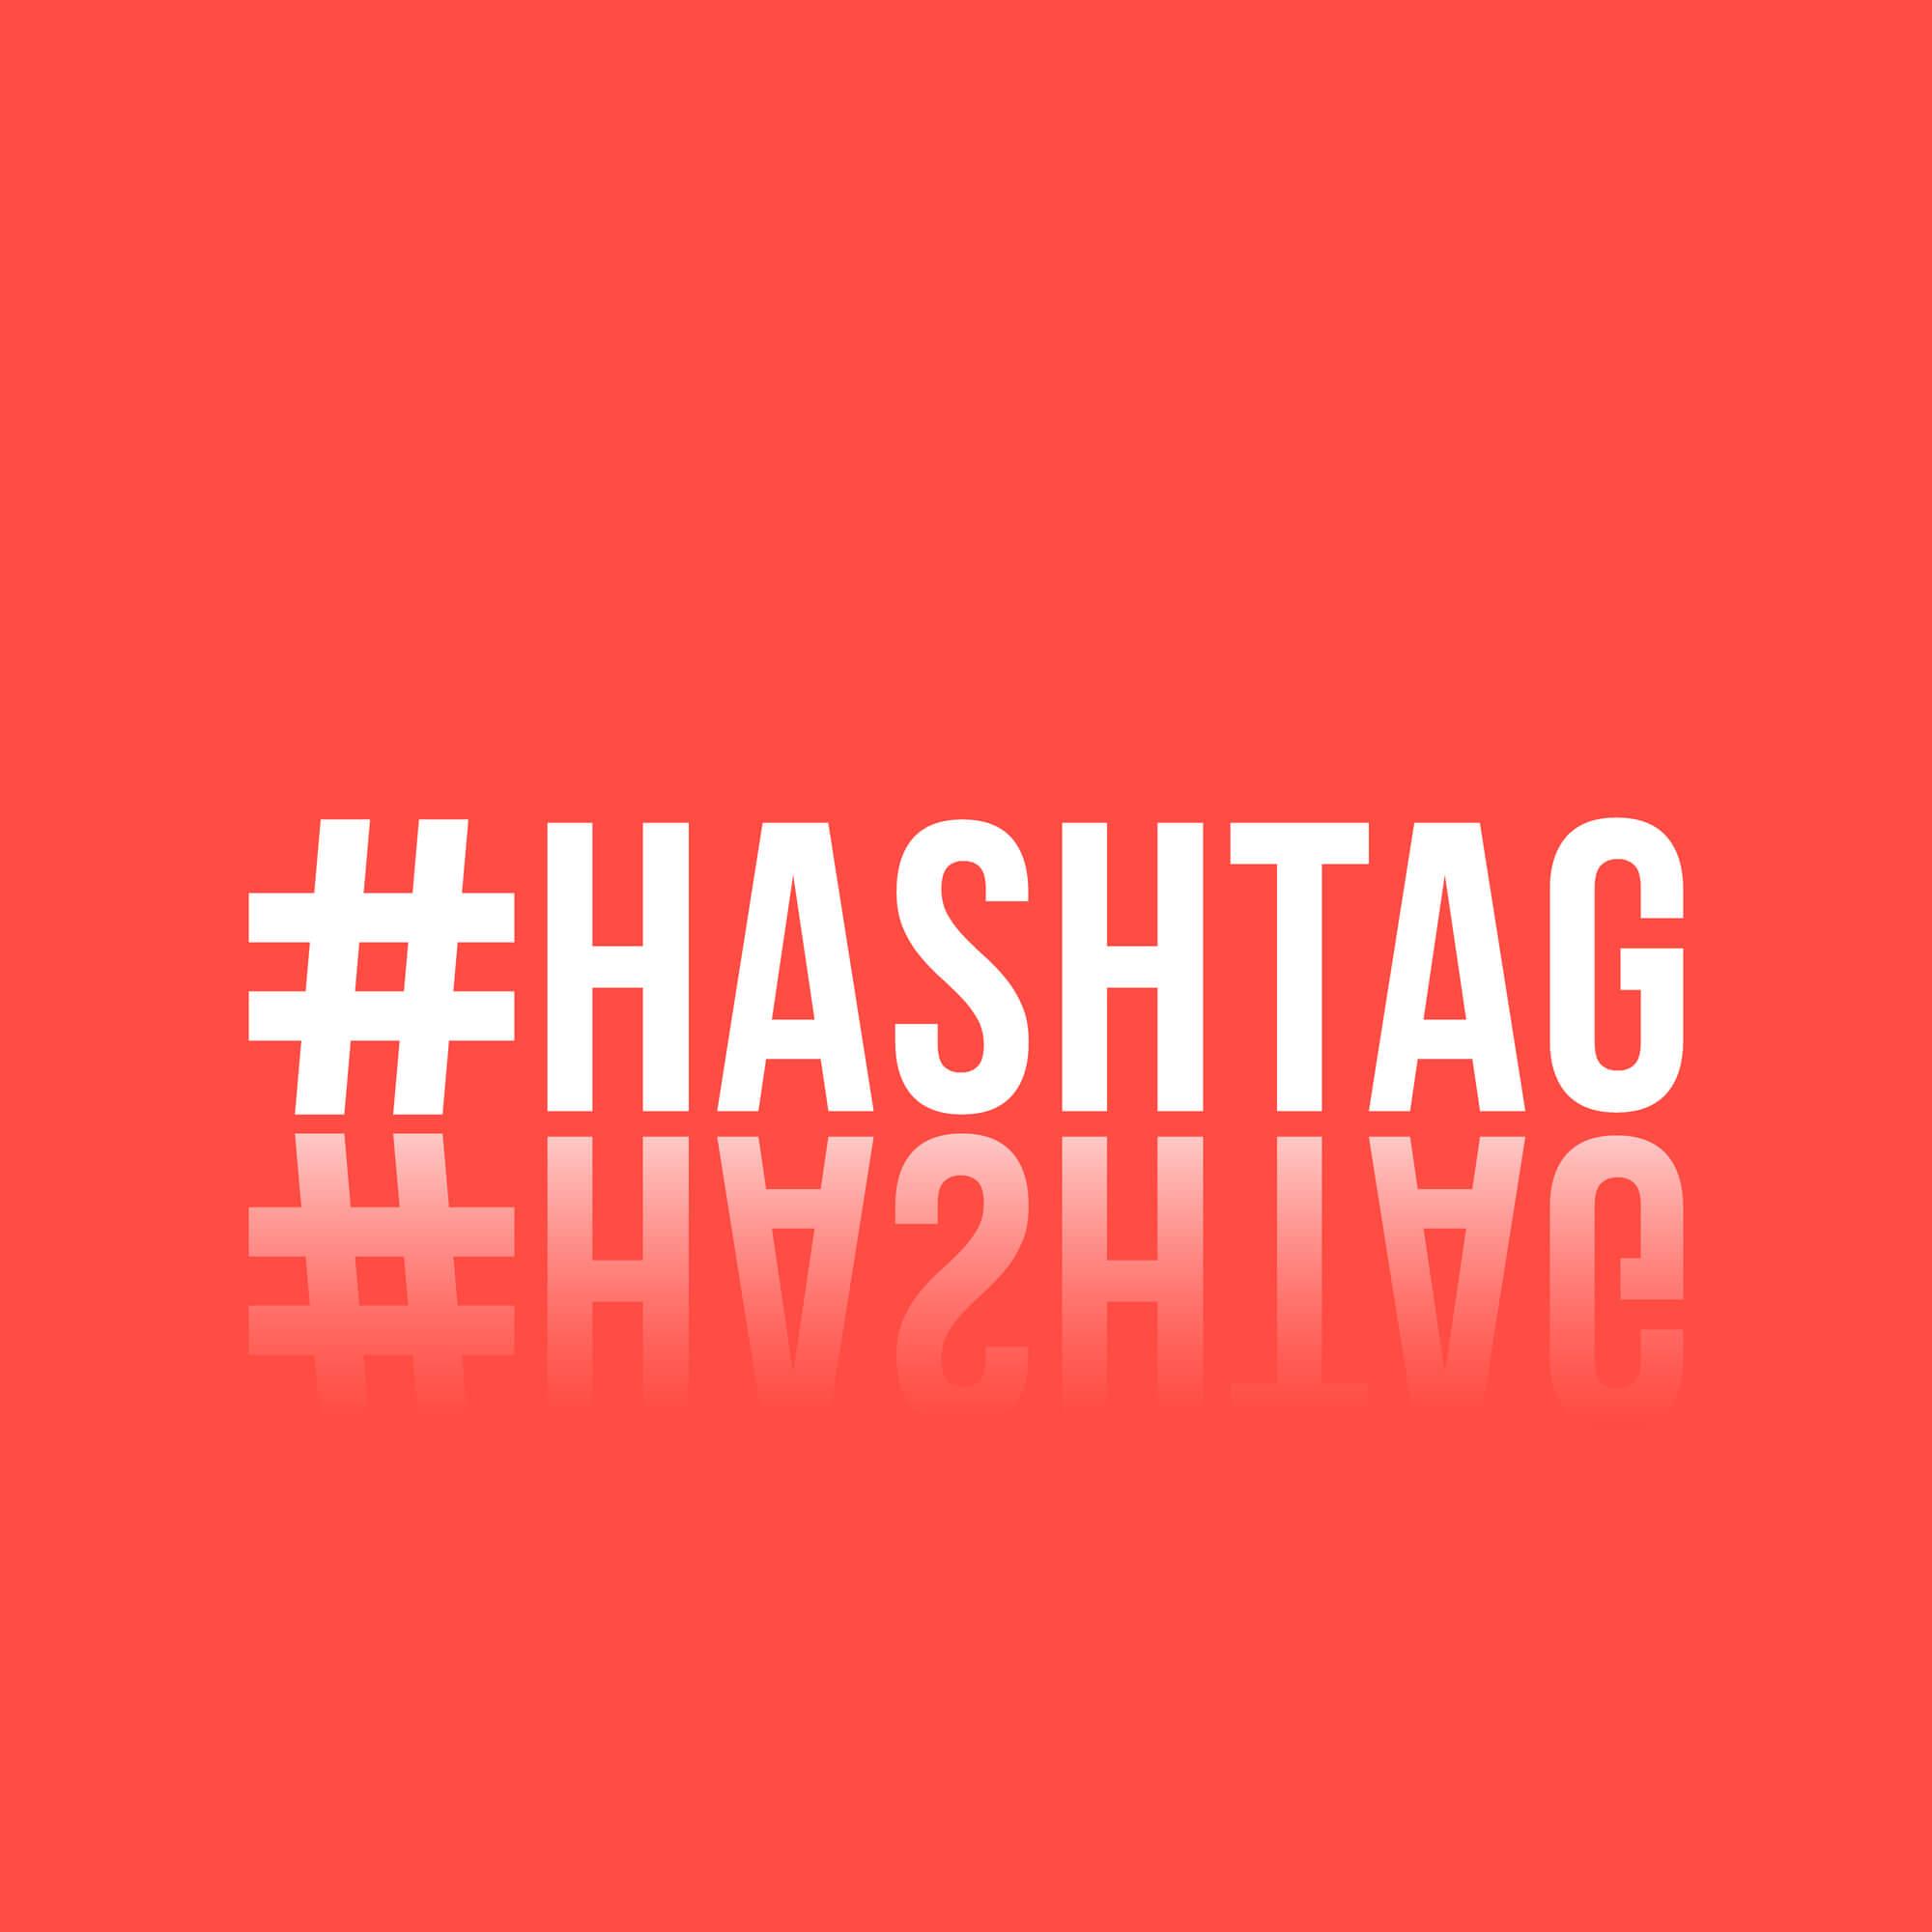 benefits-hashtags-smm-tips